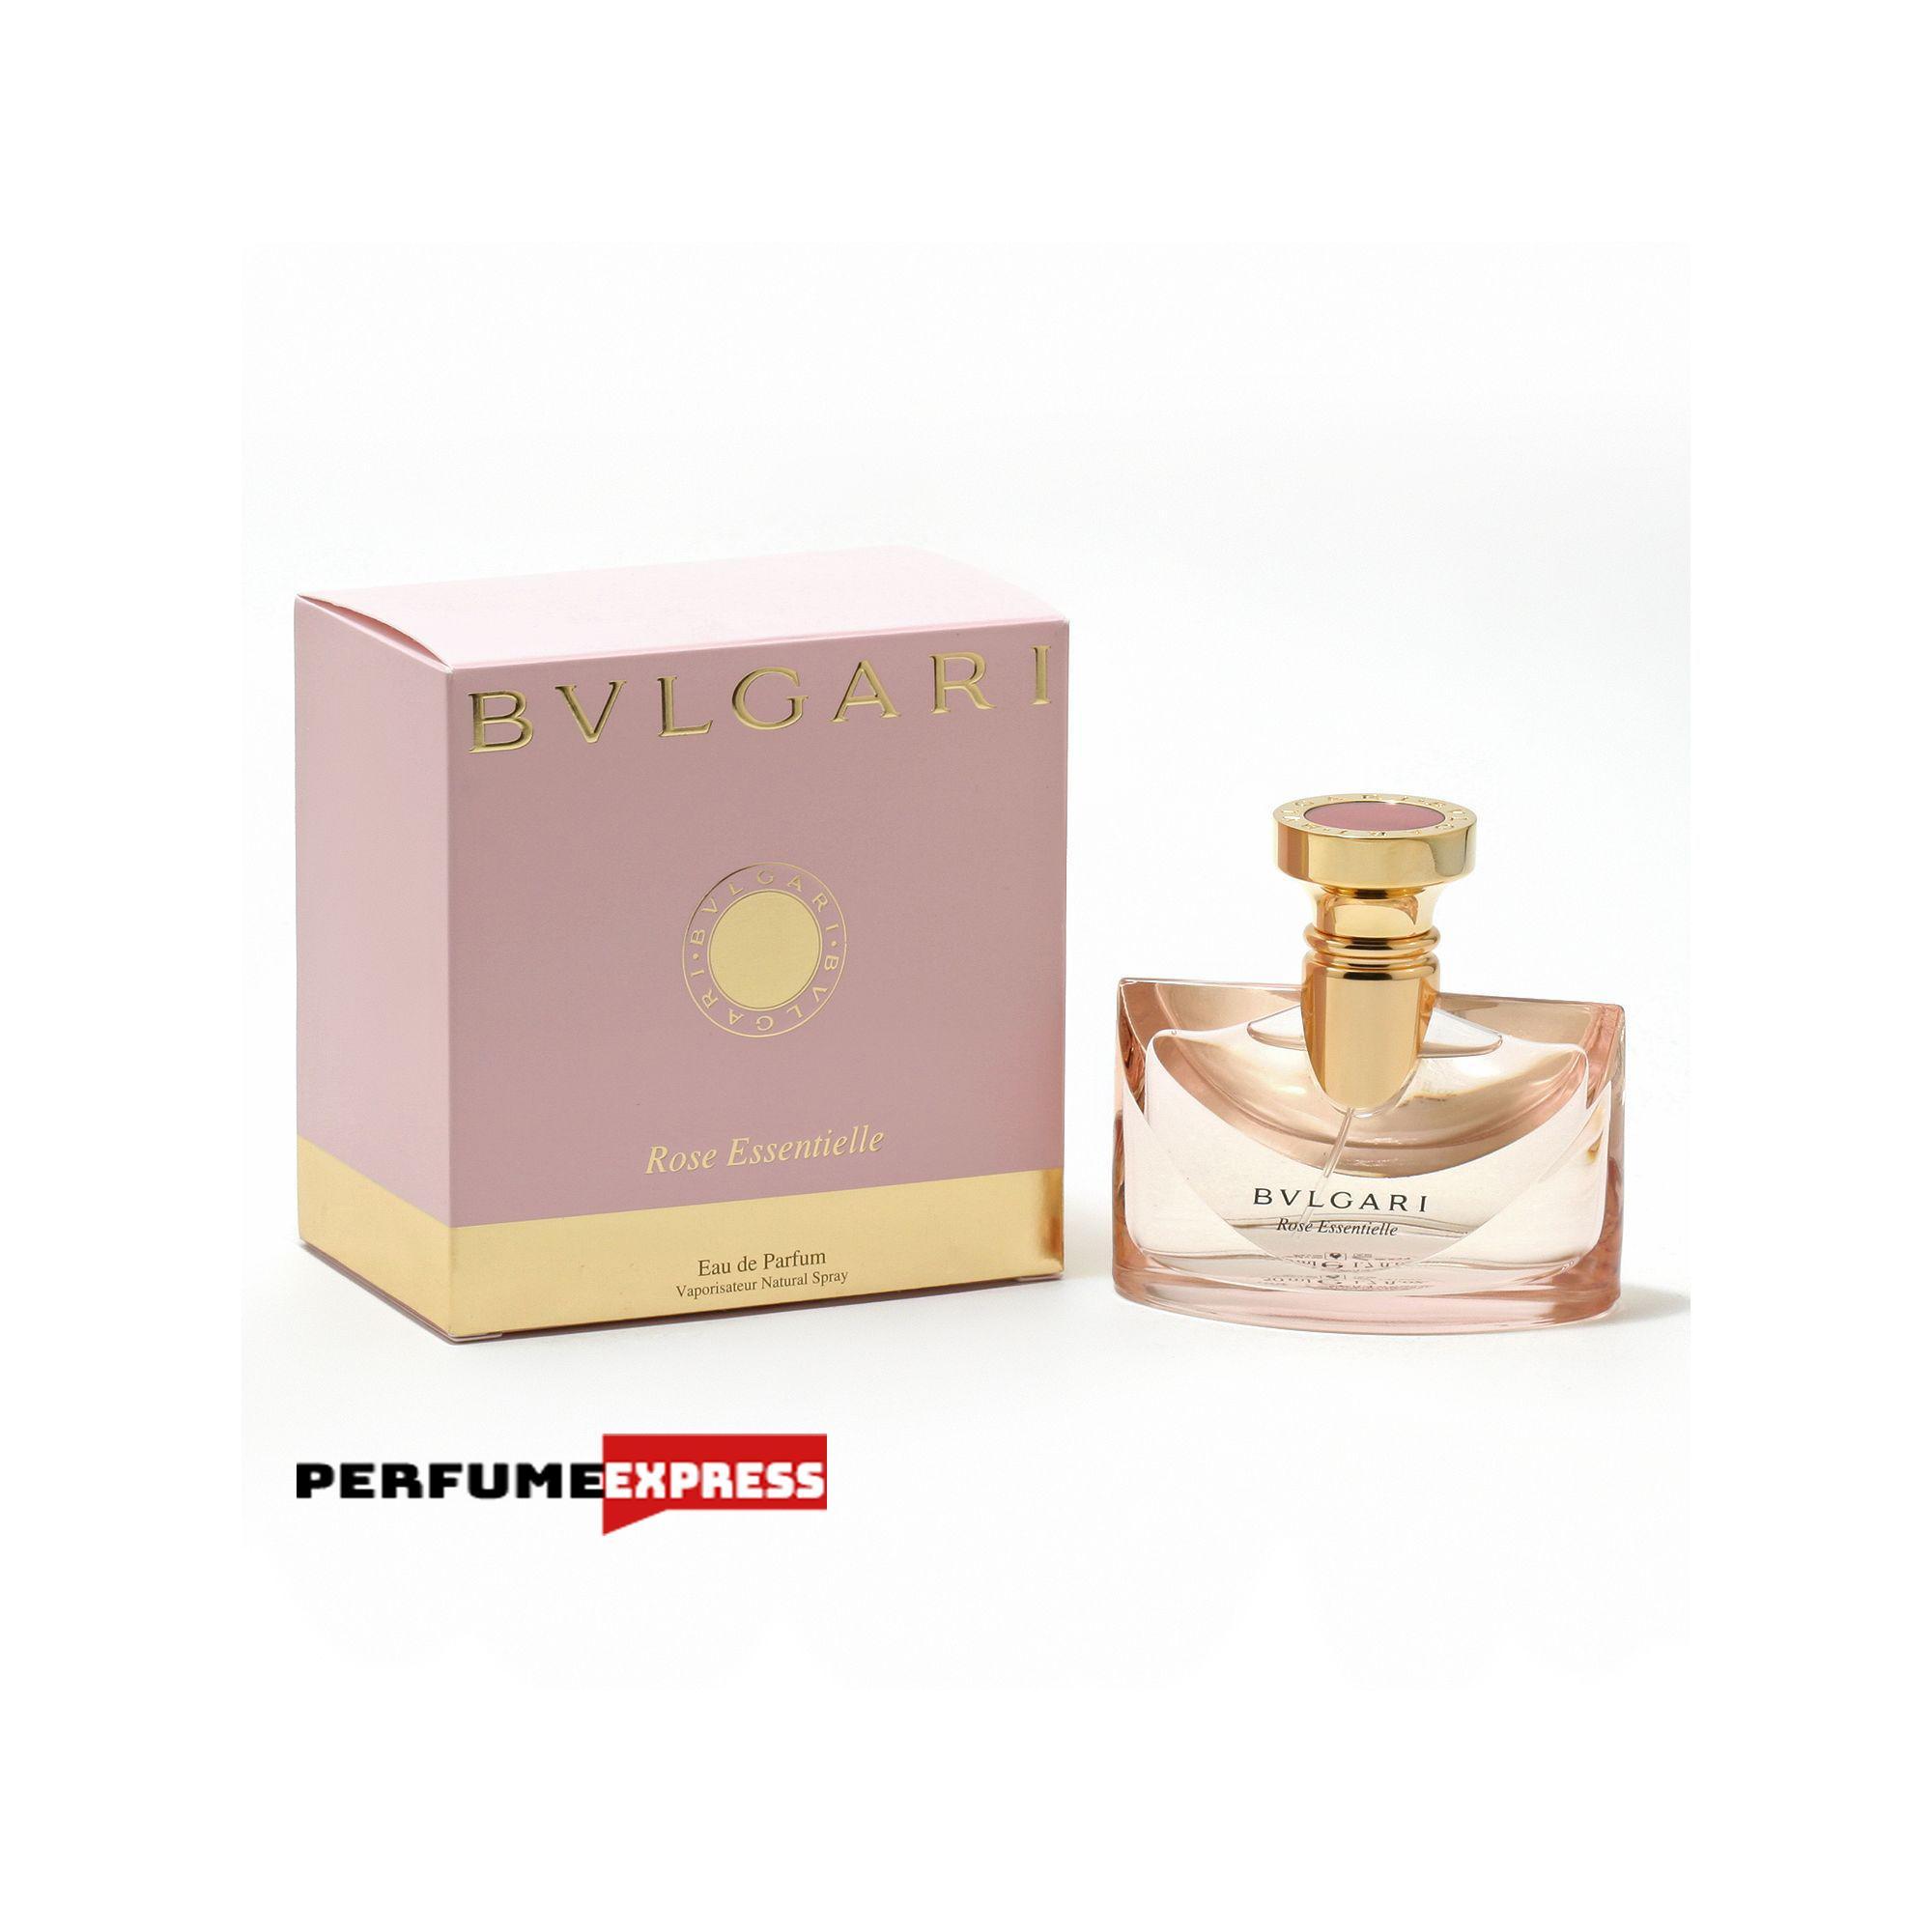 Buy Bvlgari Fragrances Beauty Products Lazada Omnia Amethyste 65 Ml Non Box Rose Essentielle Edp For Women 100ml